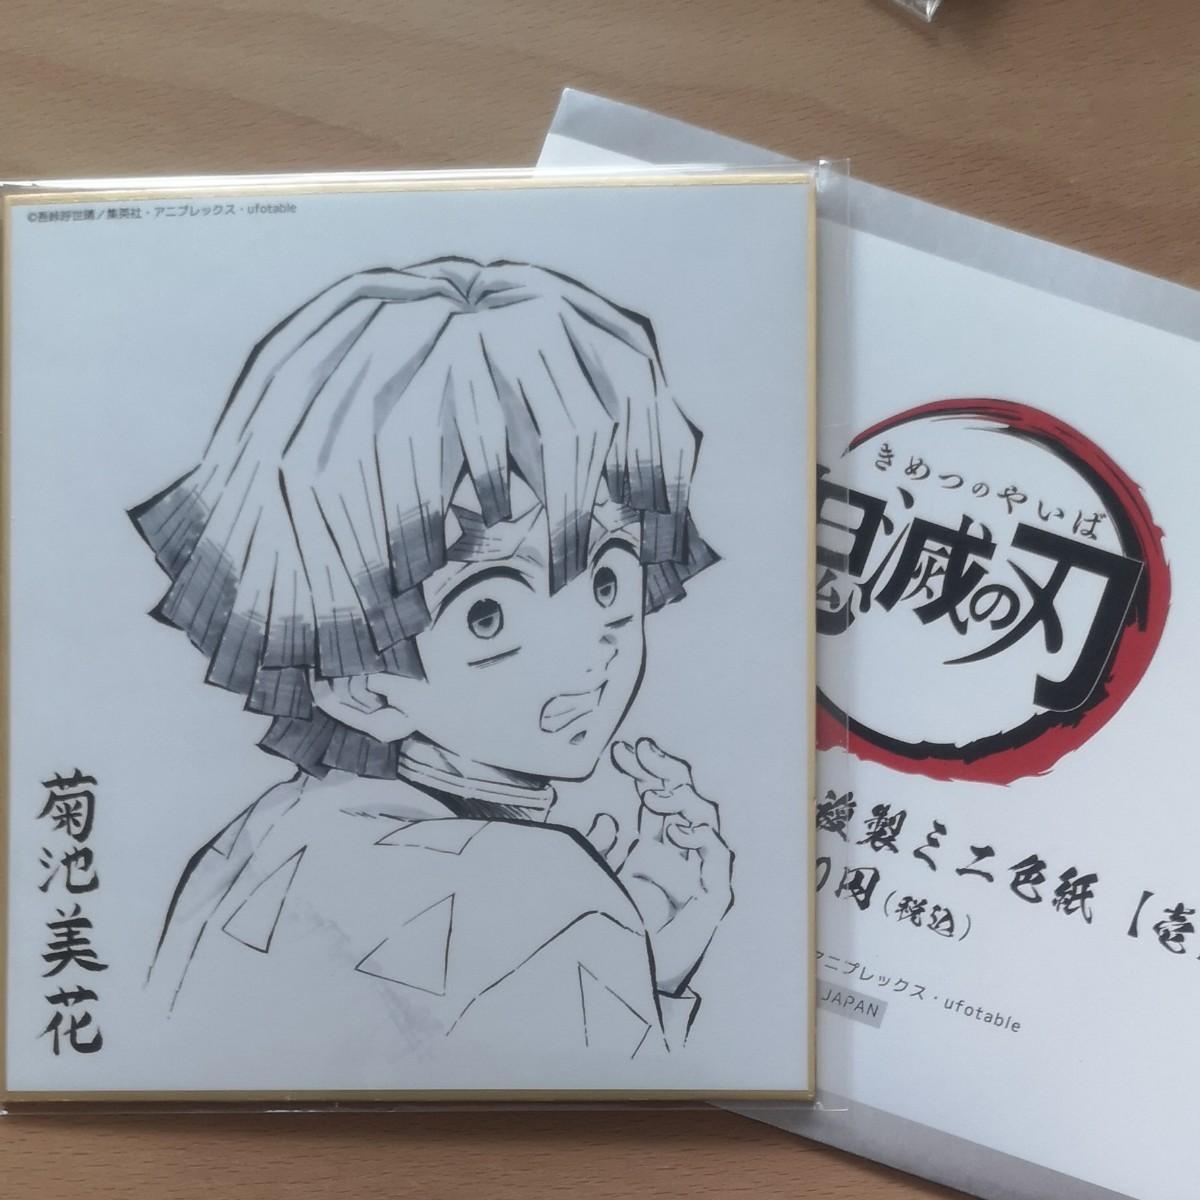 鬼滅の刃 全集中展 複製ミニ色紙【壱】我妻善逸